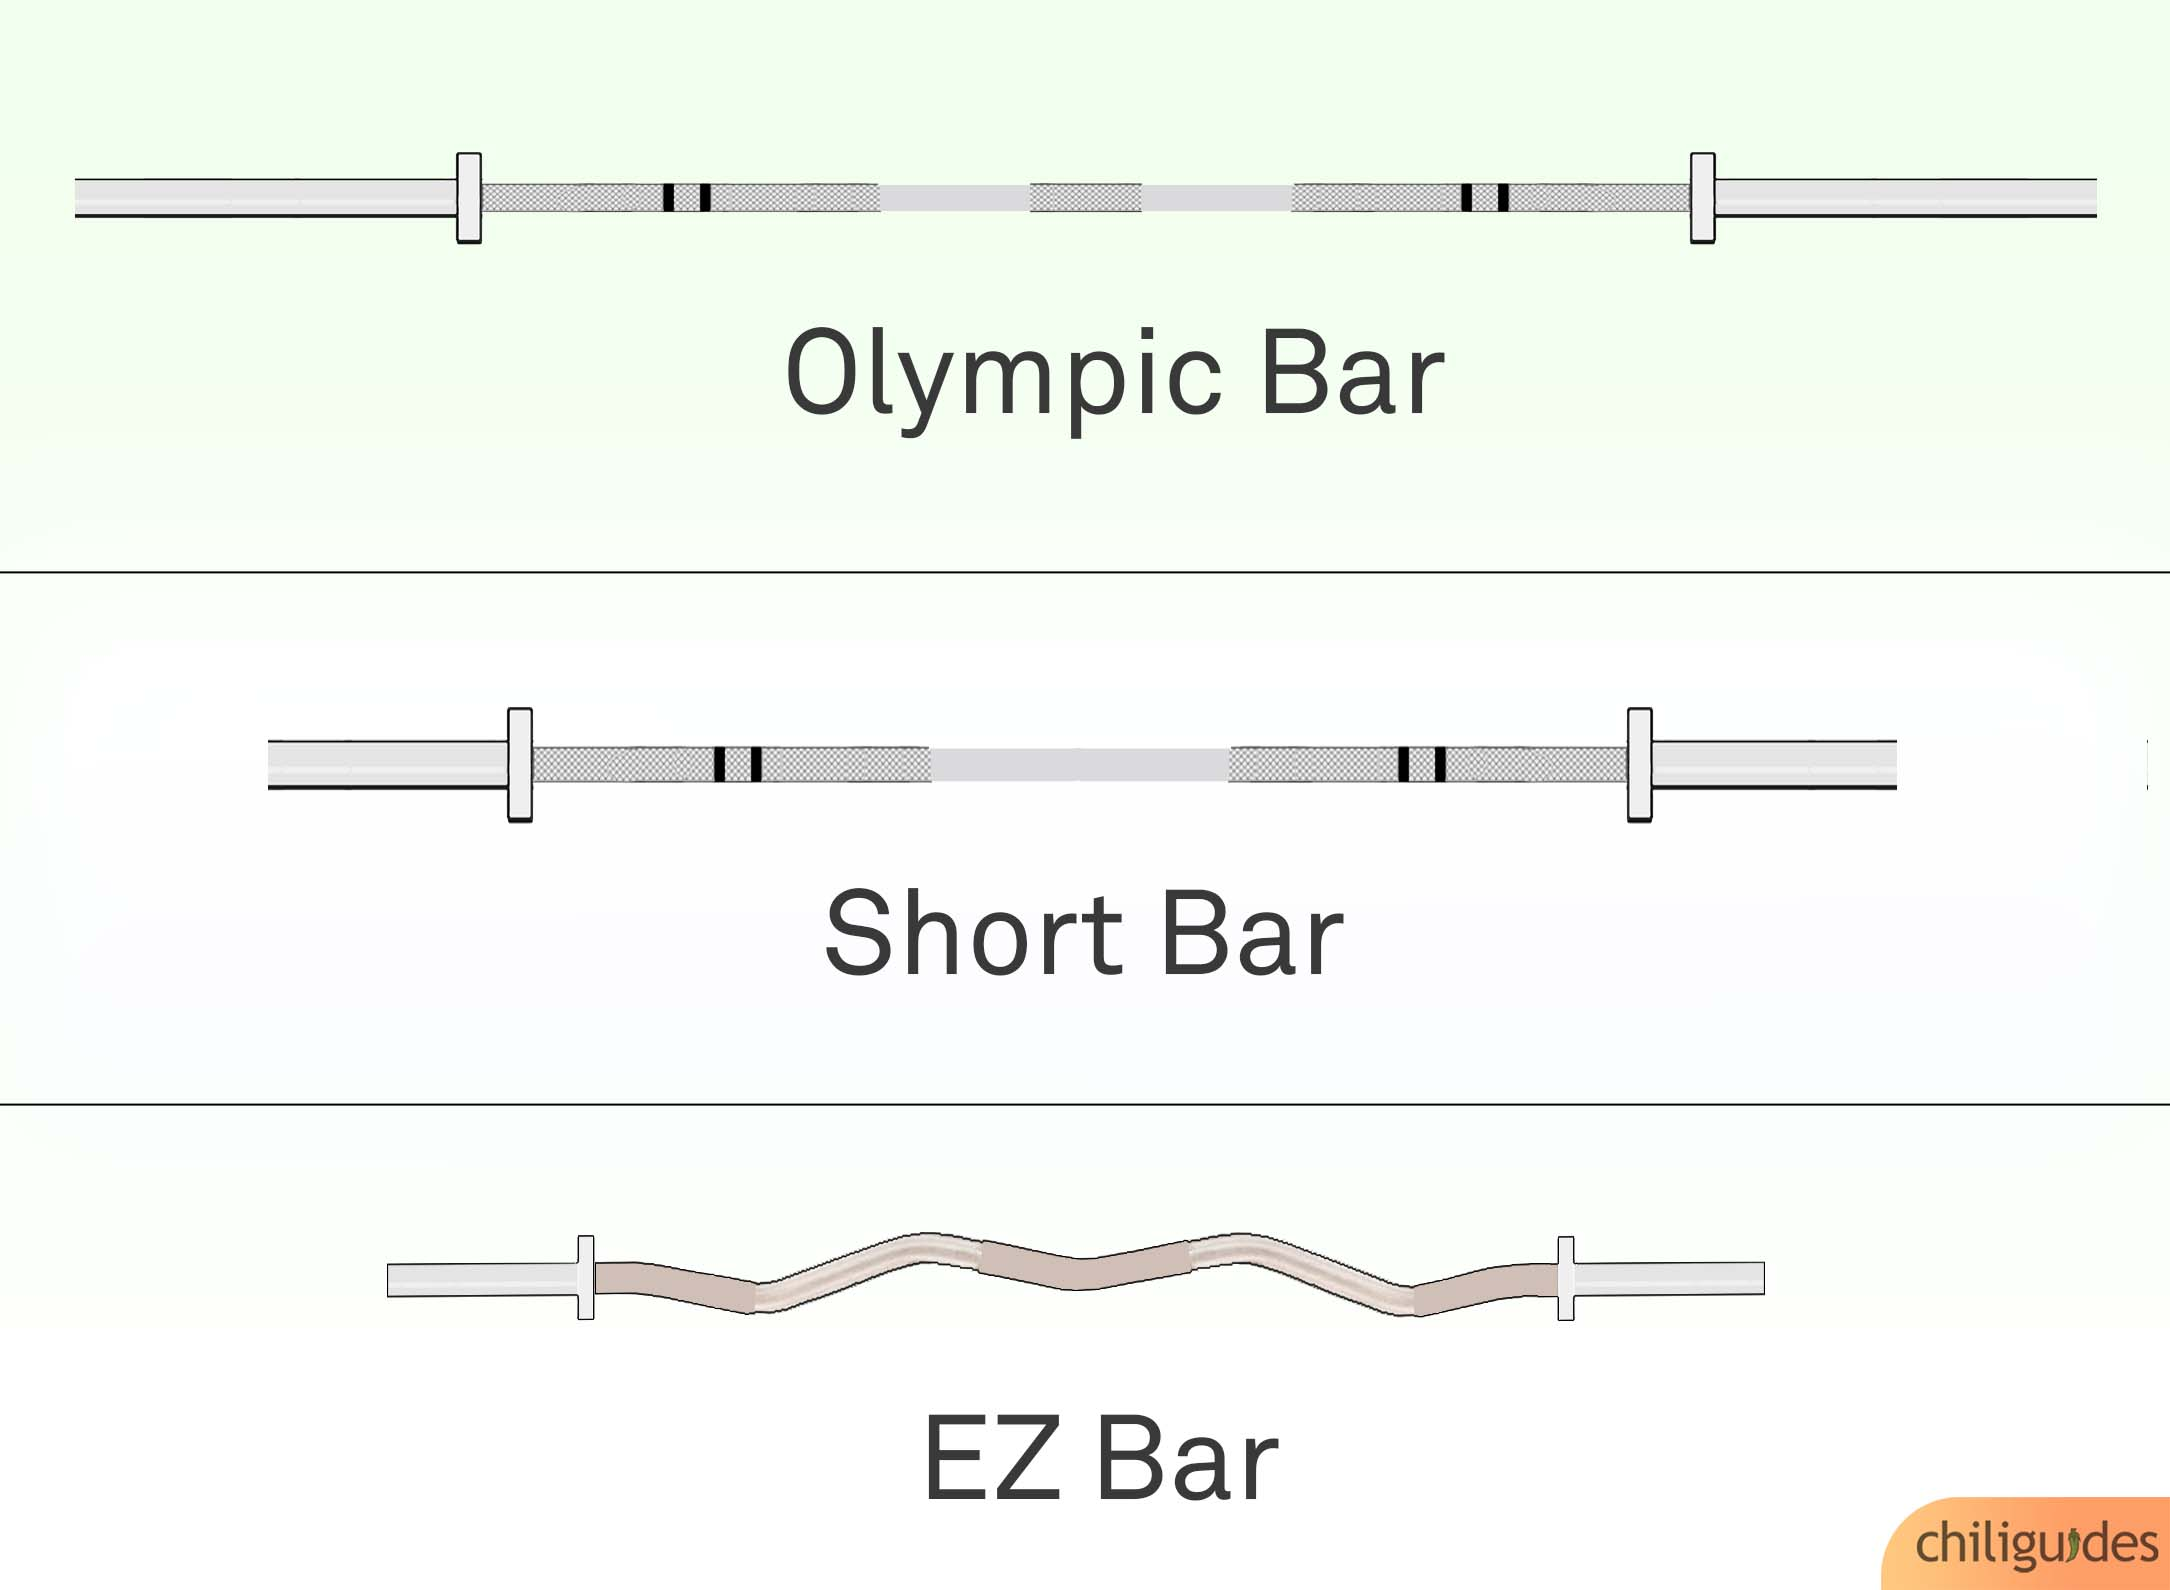 <p><b>Olympic bar vs. Short Olympic bar vs. EZ bar</b></p>